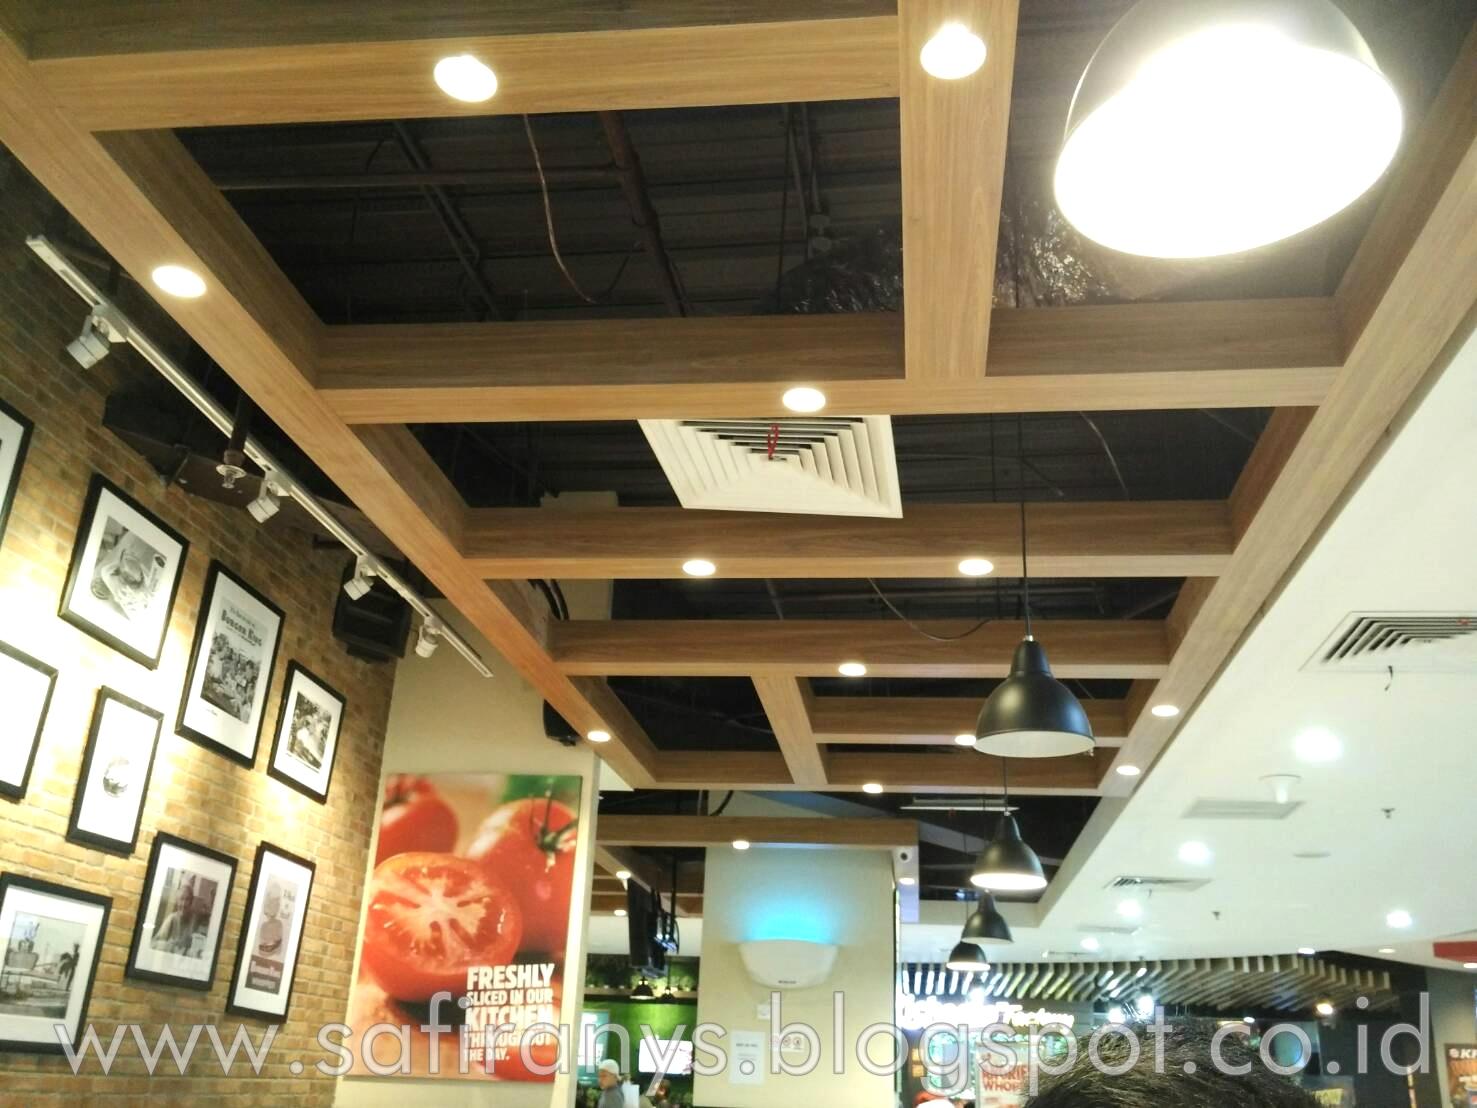 Safira Nys: Burger King BEC (Bandung Electronic Centre